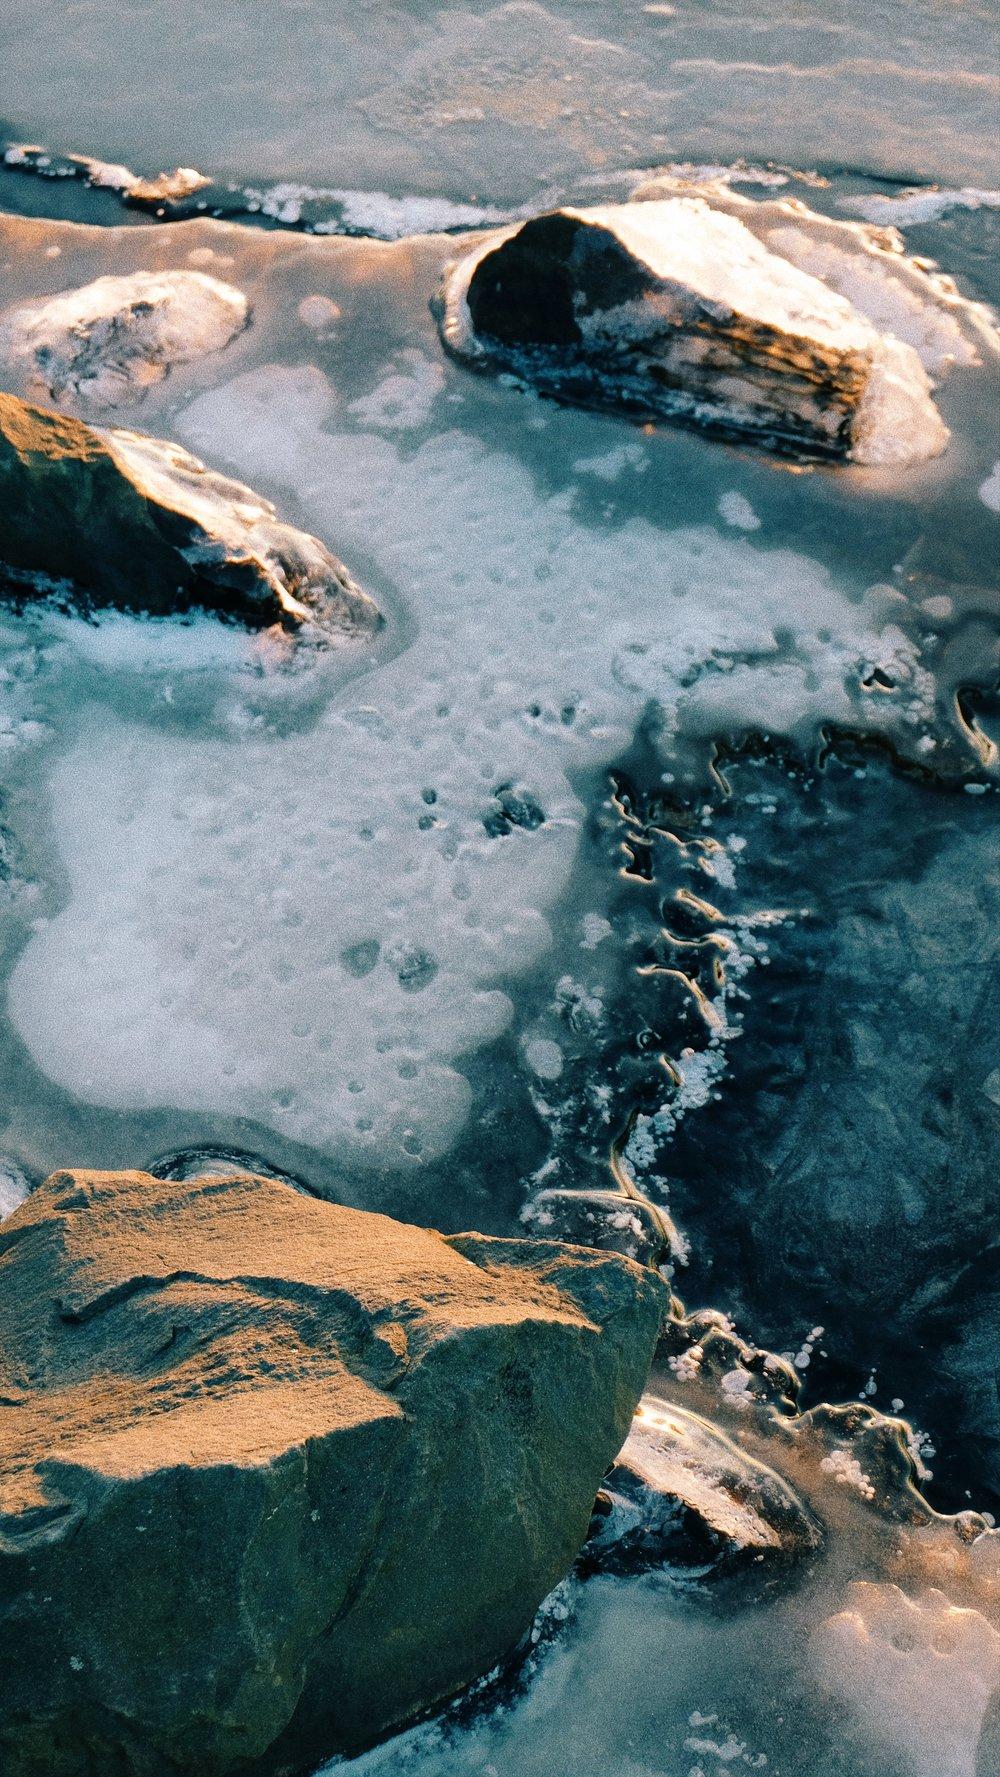 golen-hour-lake-snow-rock.JPG